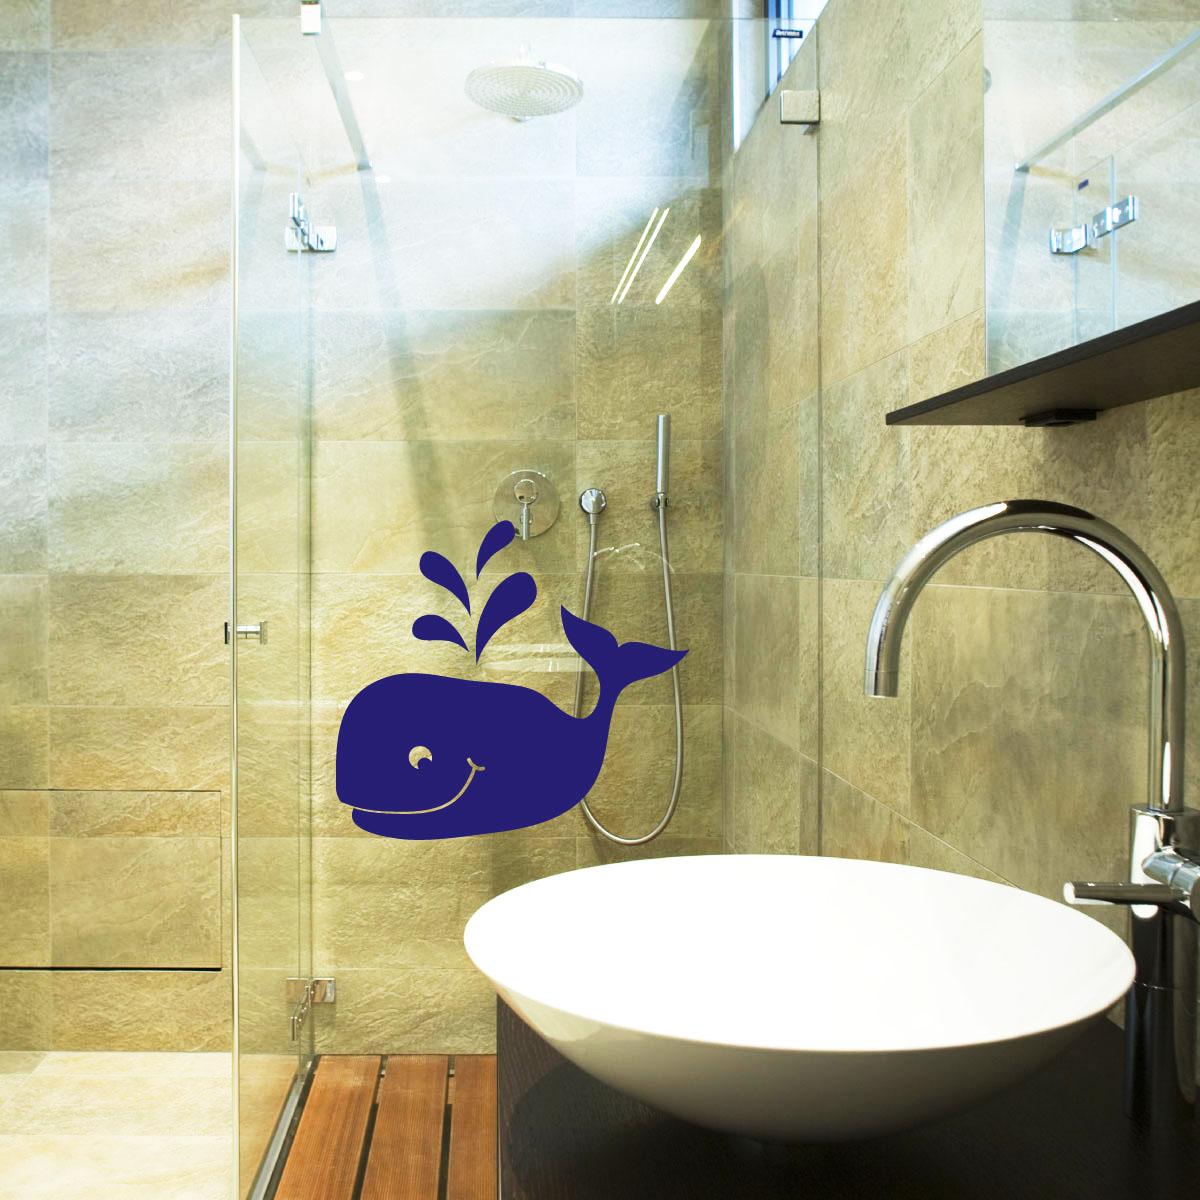 stickers muraux pour salle de bain sticker mural baleine. Black Bedroom Furniture Sets. Home Design Ideas